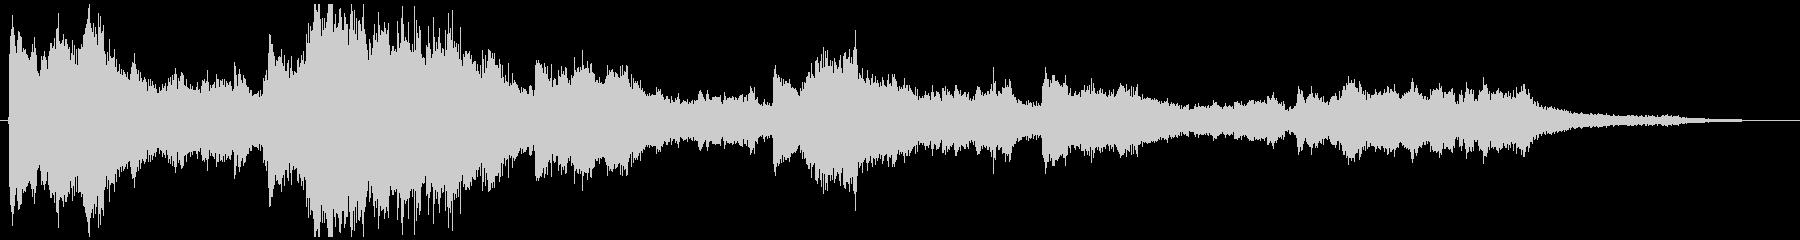 PADS オーロラ01の未再生の波形